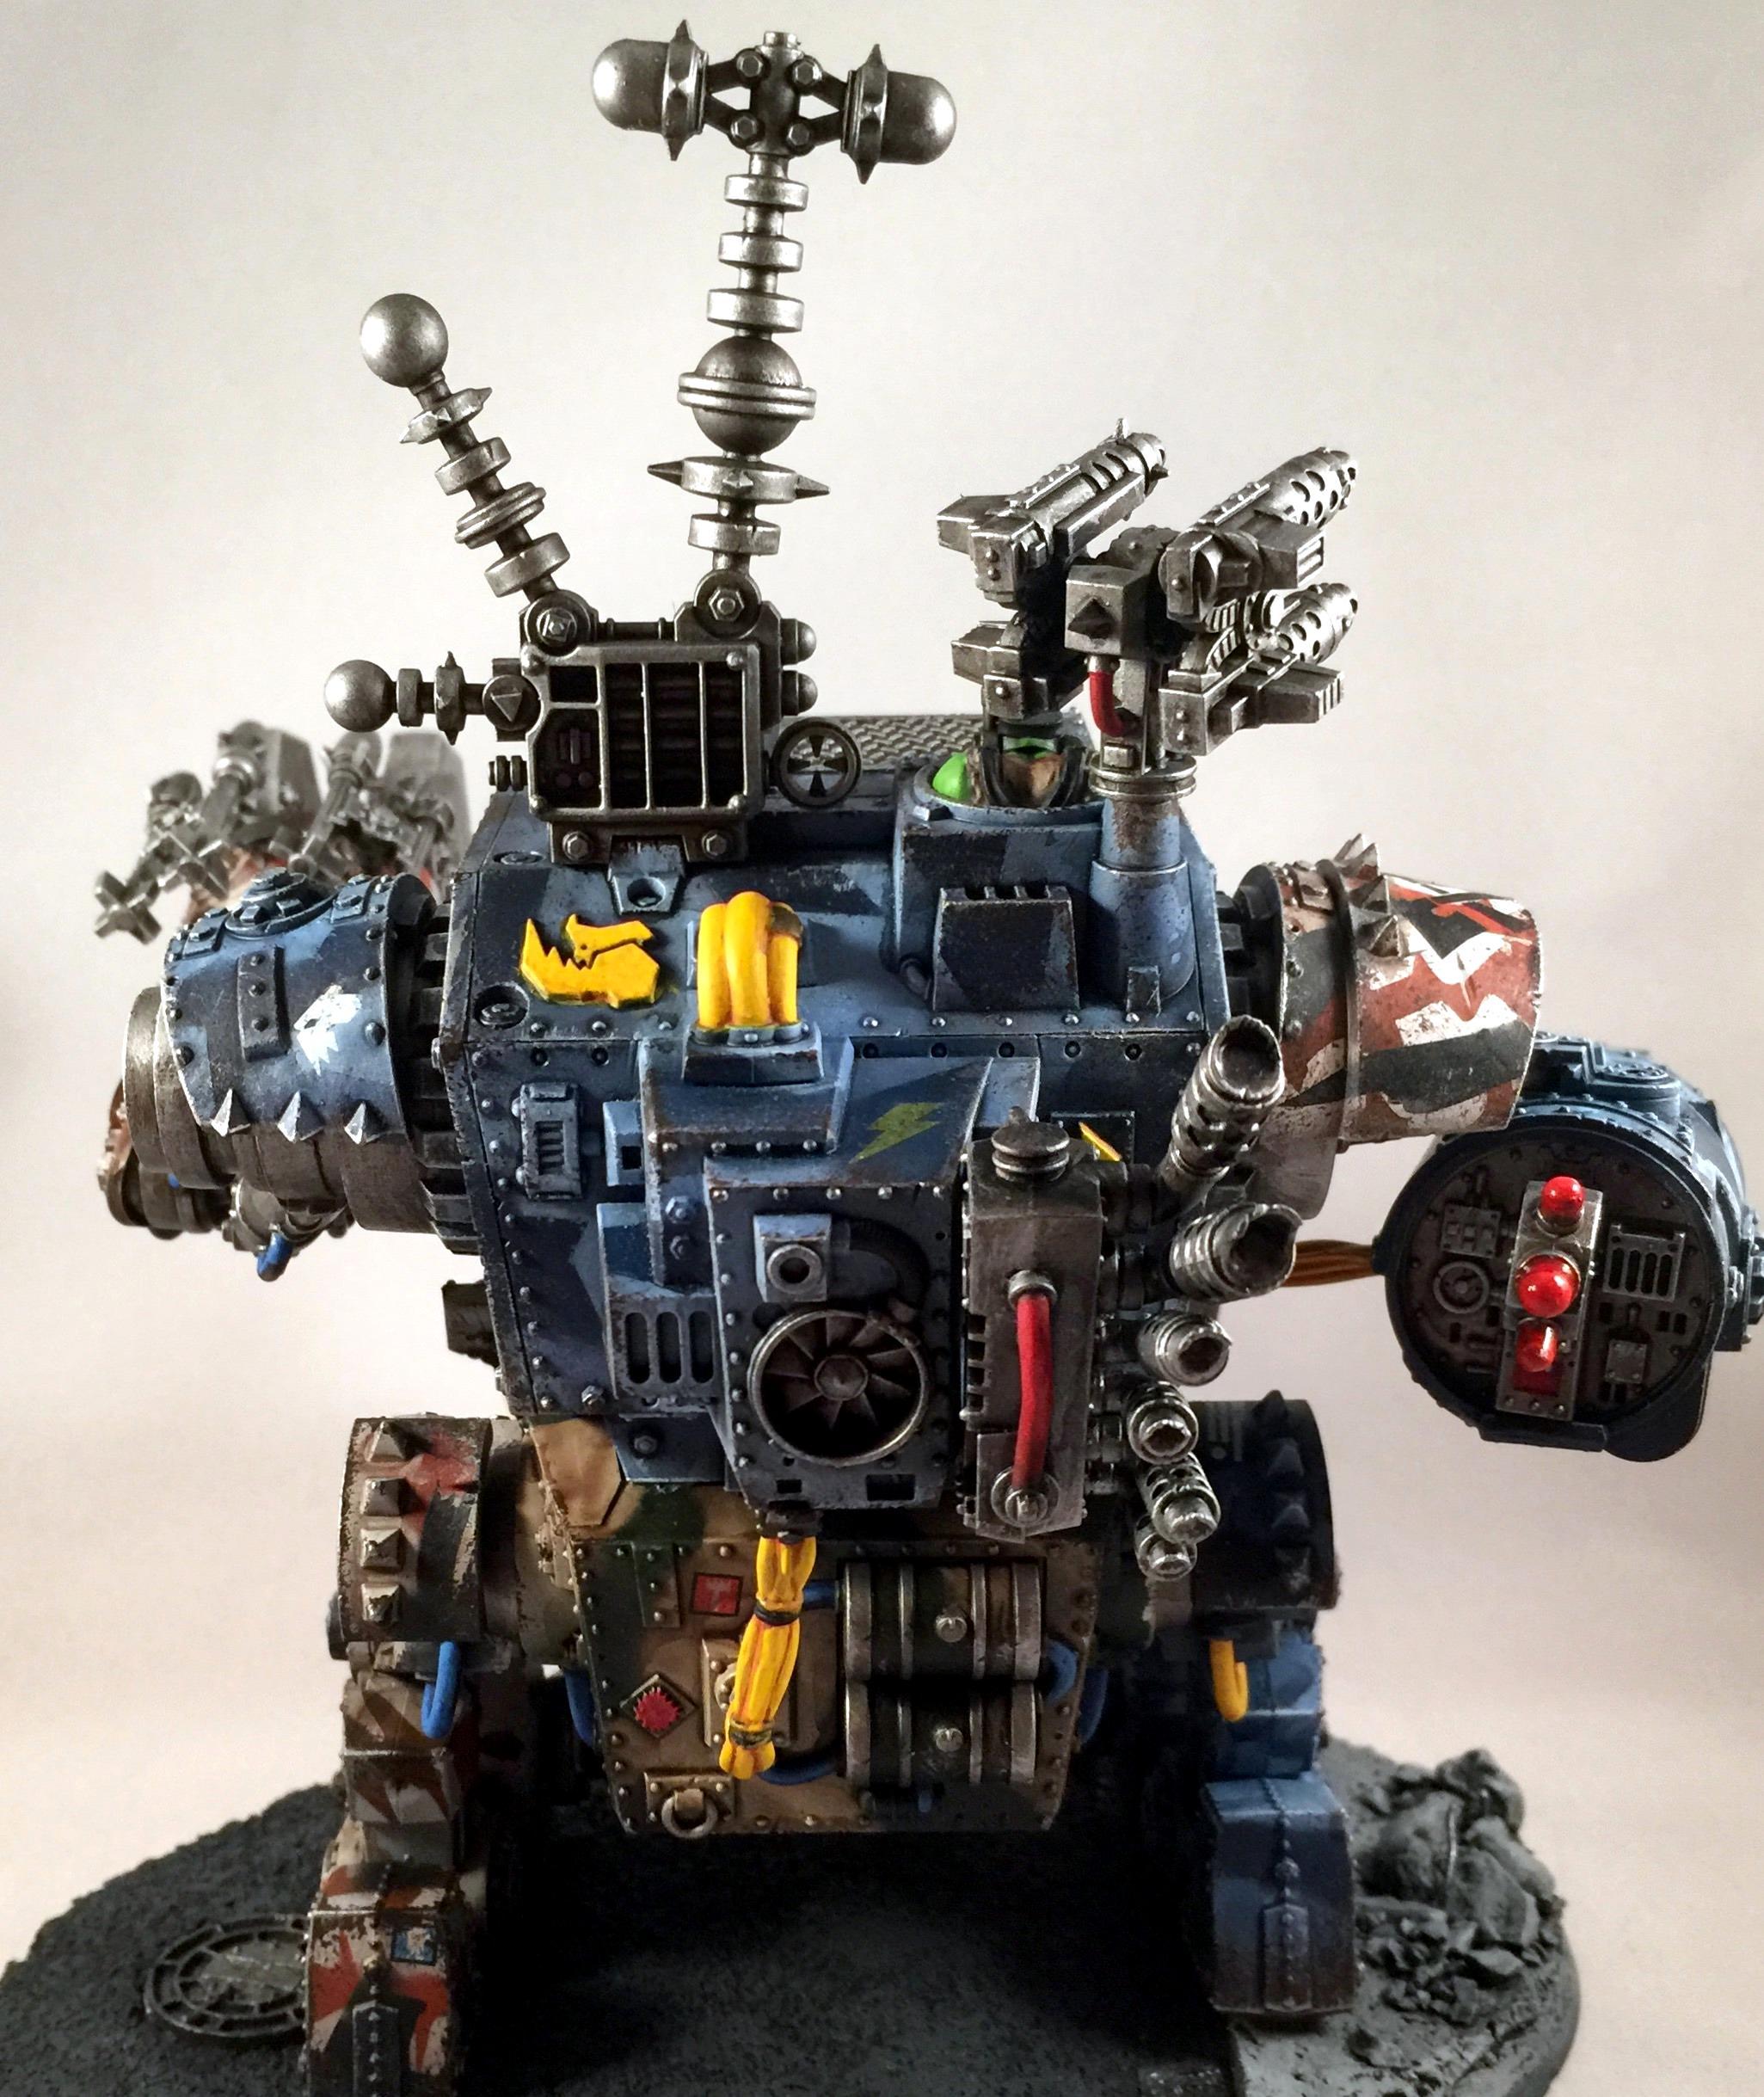 Blood Axe, Morkanaut, Orks, Warhammer 40,000